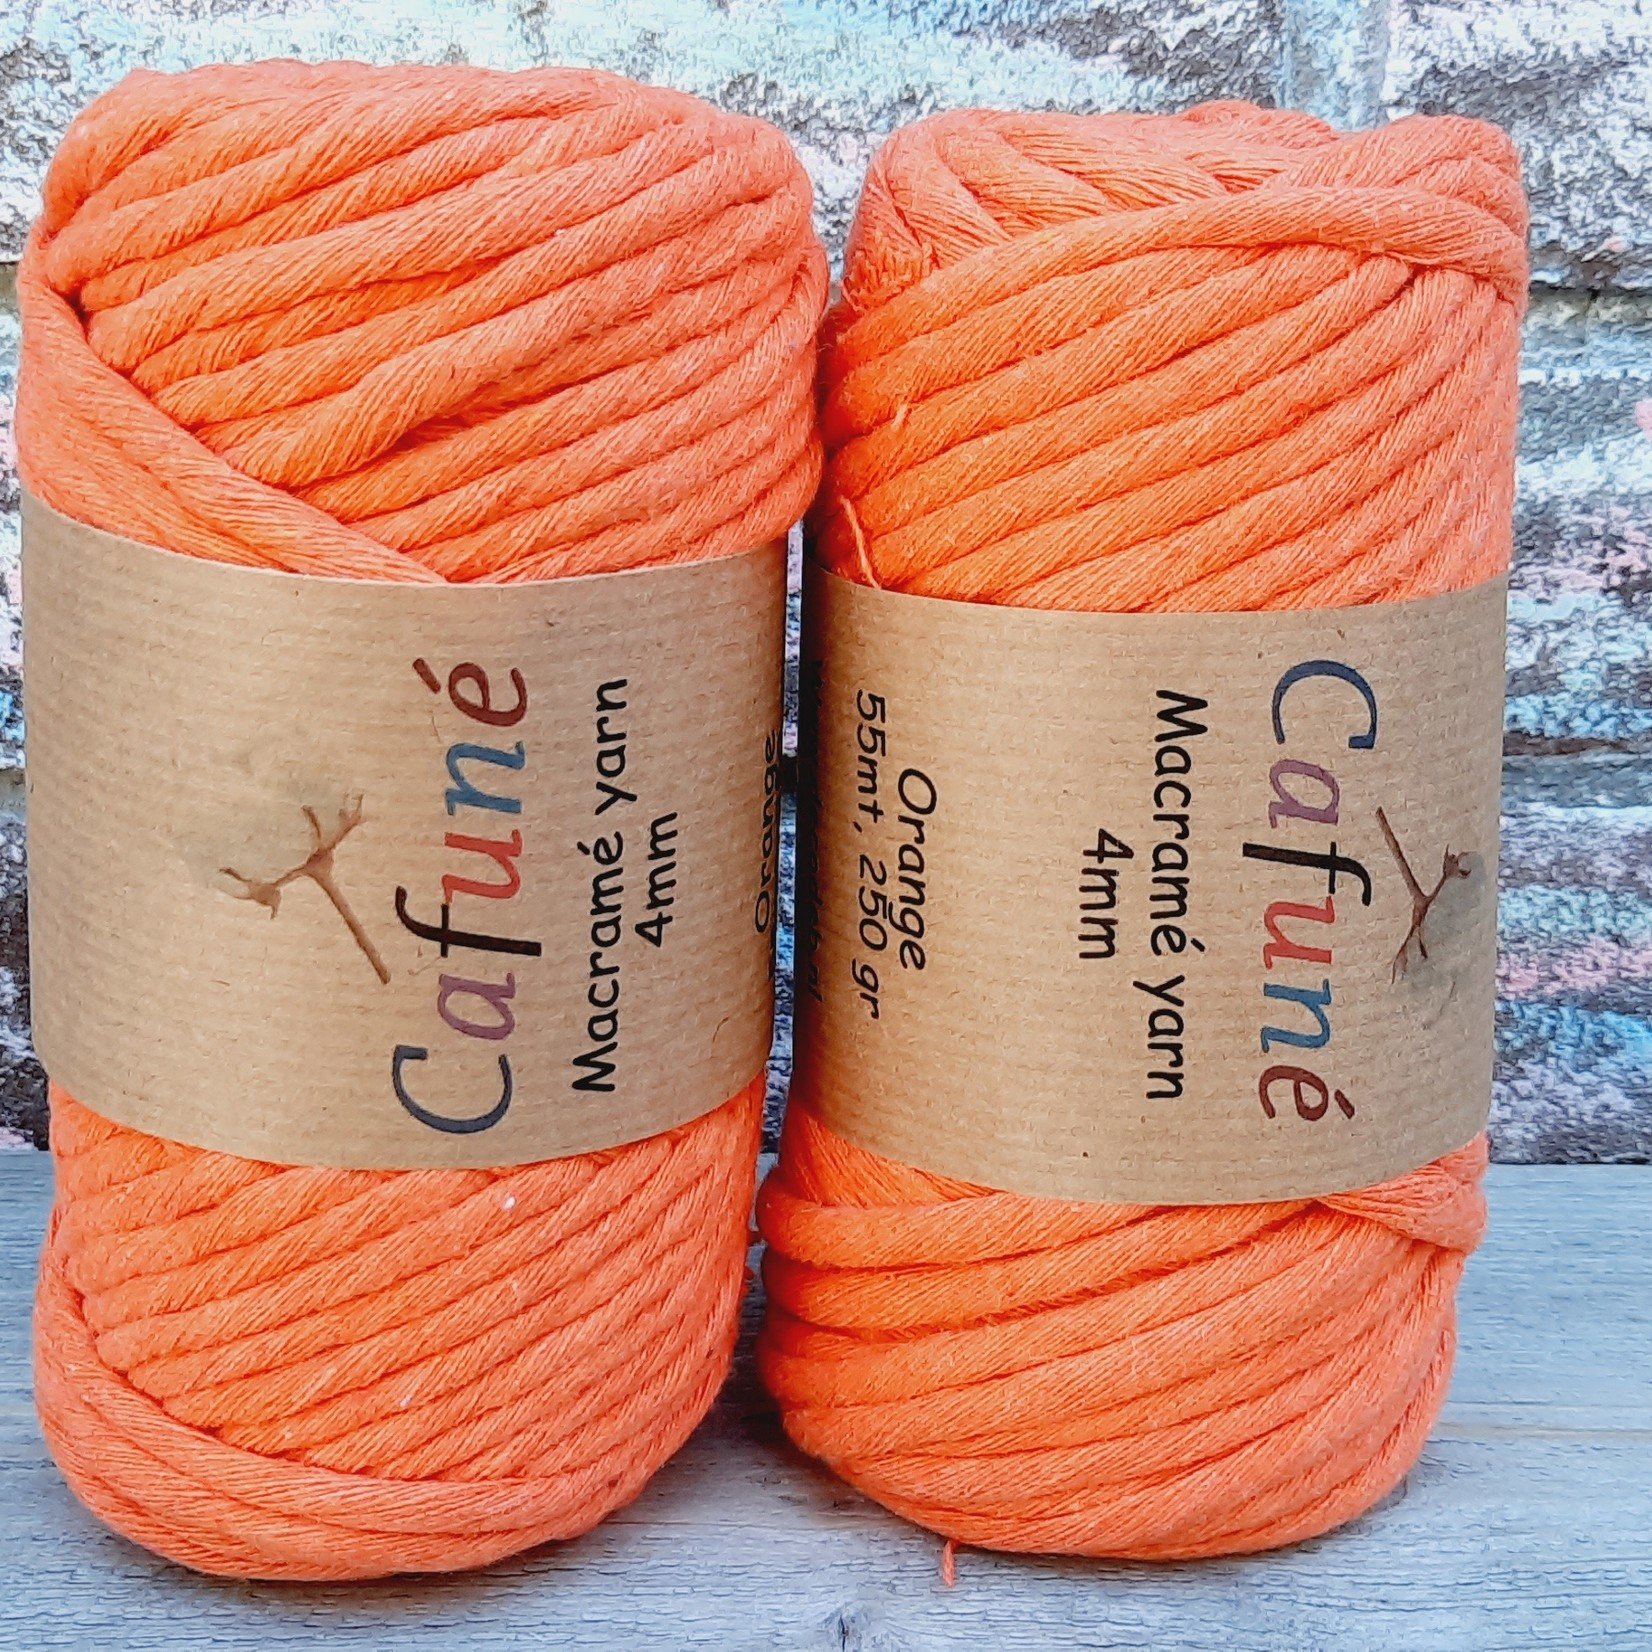 Macrame garen 4mm Oranje enkel gedraaid uitkambaar gerecycled katoen